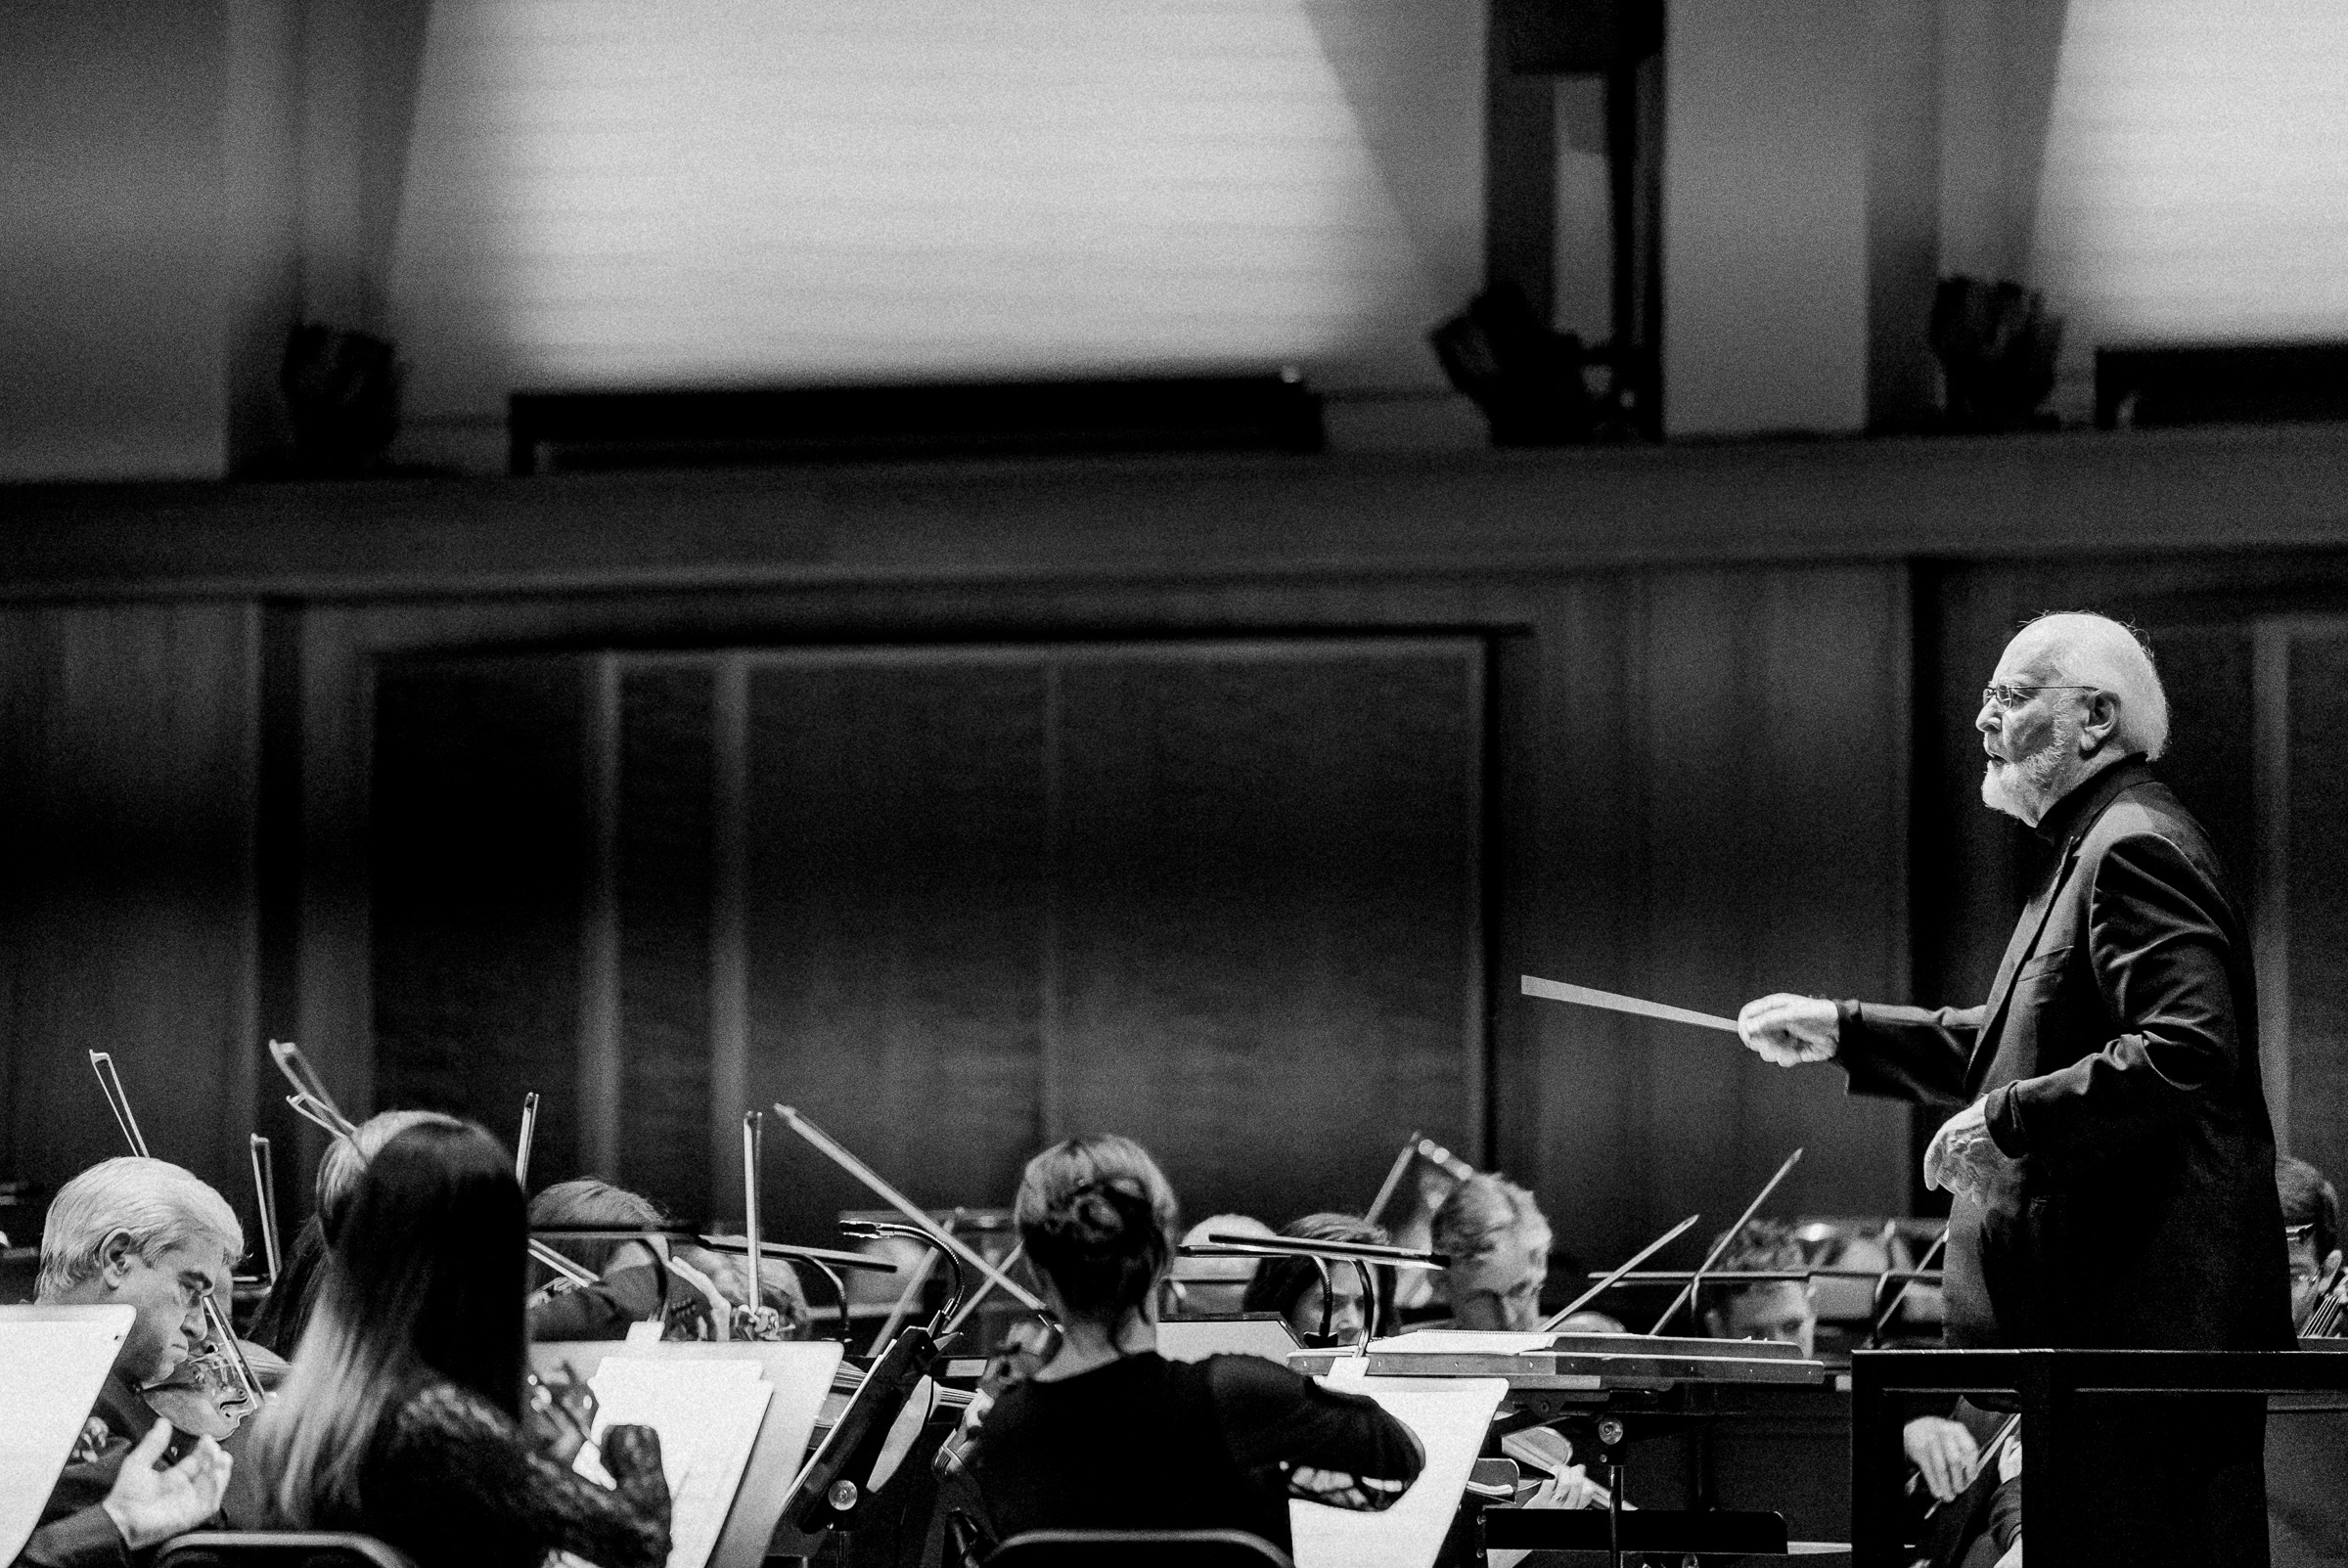 brandon_patoc_john_williams_Steven_Spielberg, Seattle_Symphony_Orchestra_Conert_0063.jpg